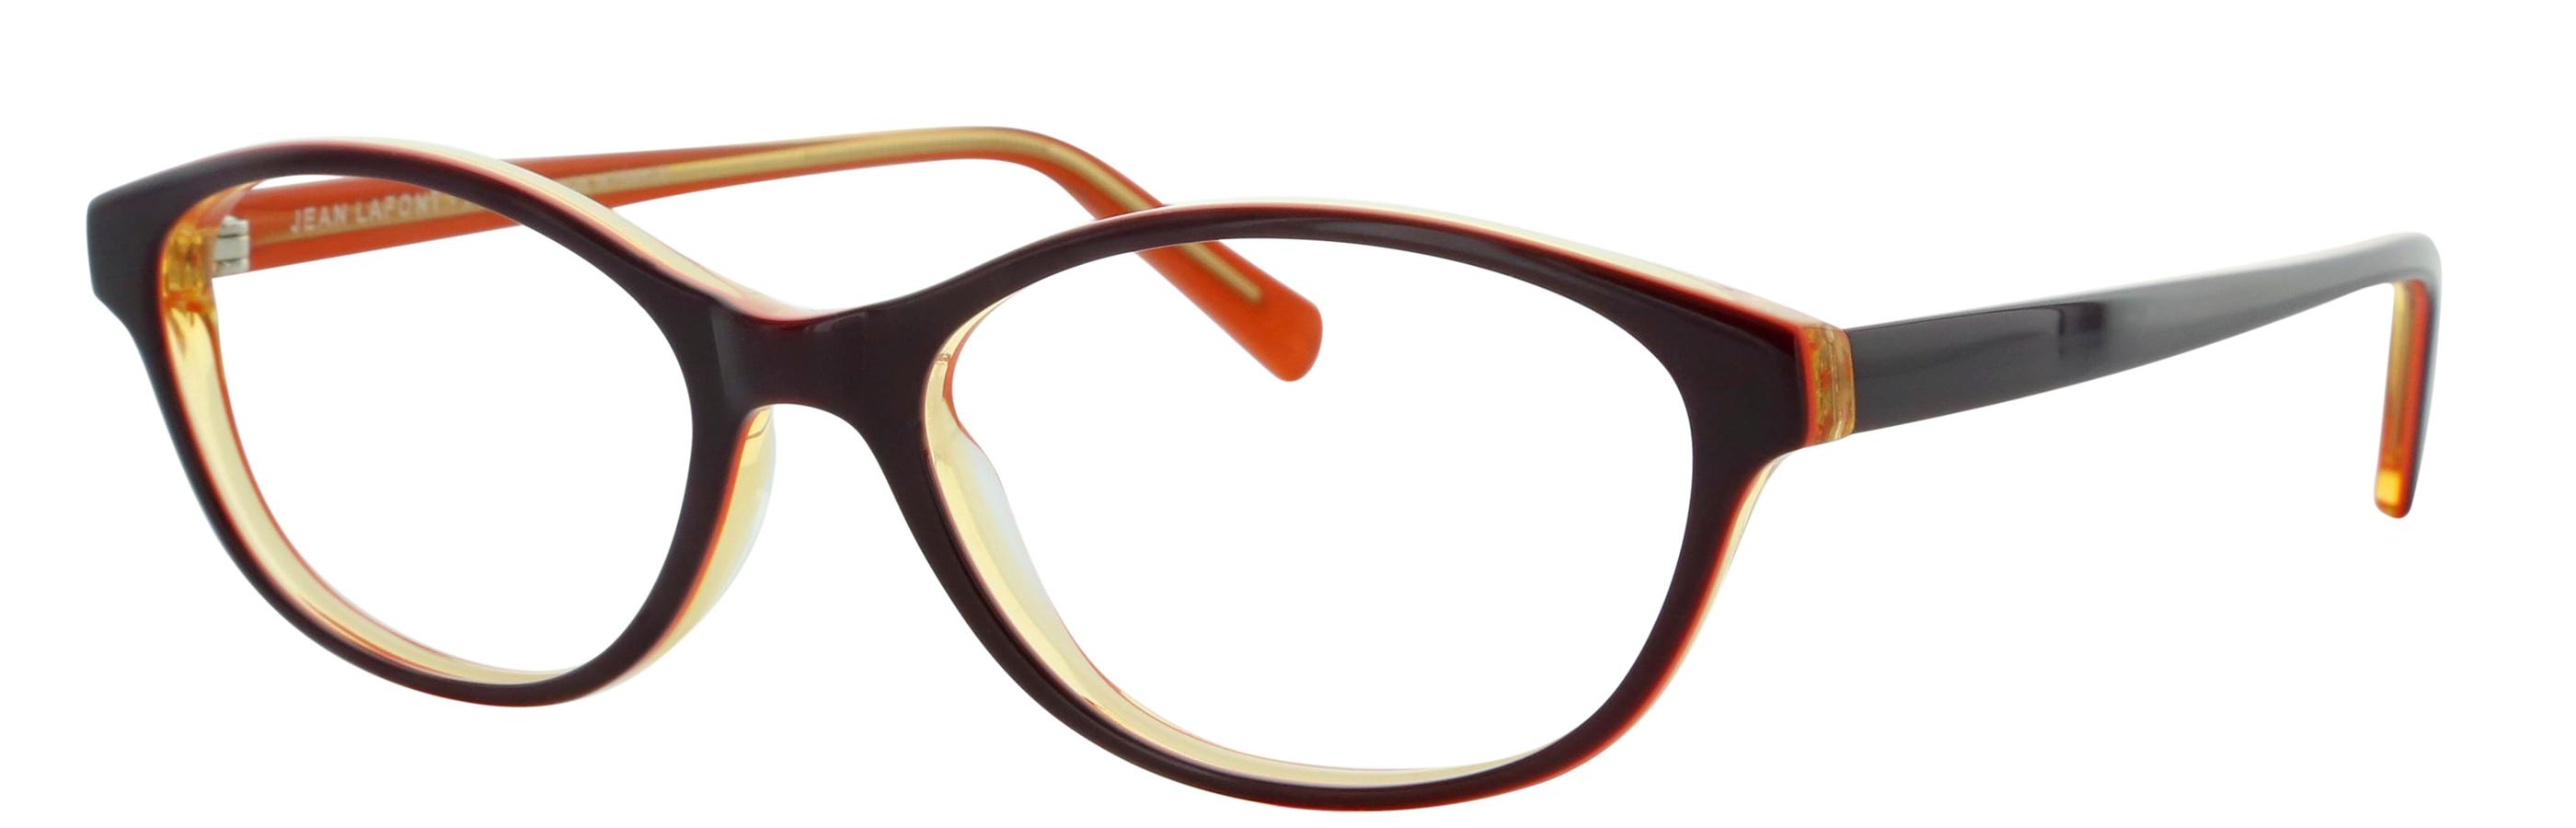 Jean lafont eyeglasses frames - Lafont Soupir 7038